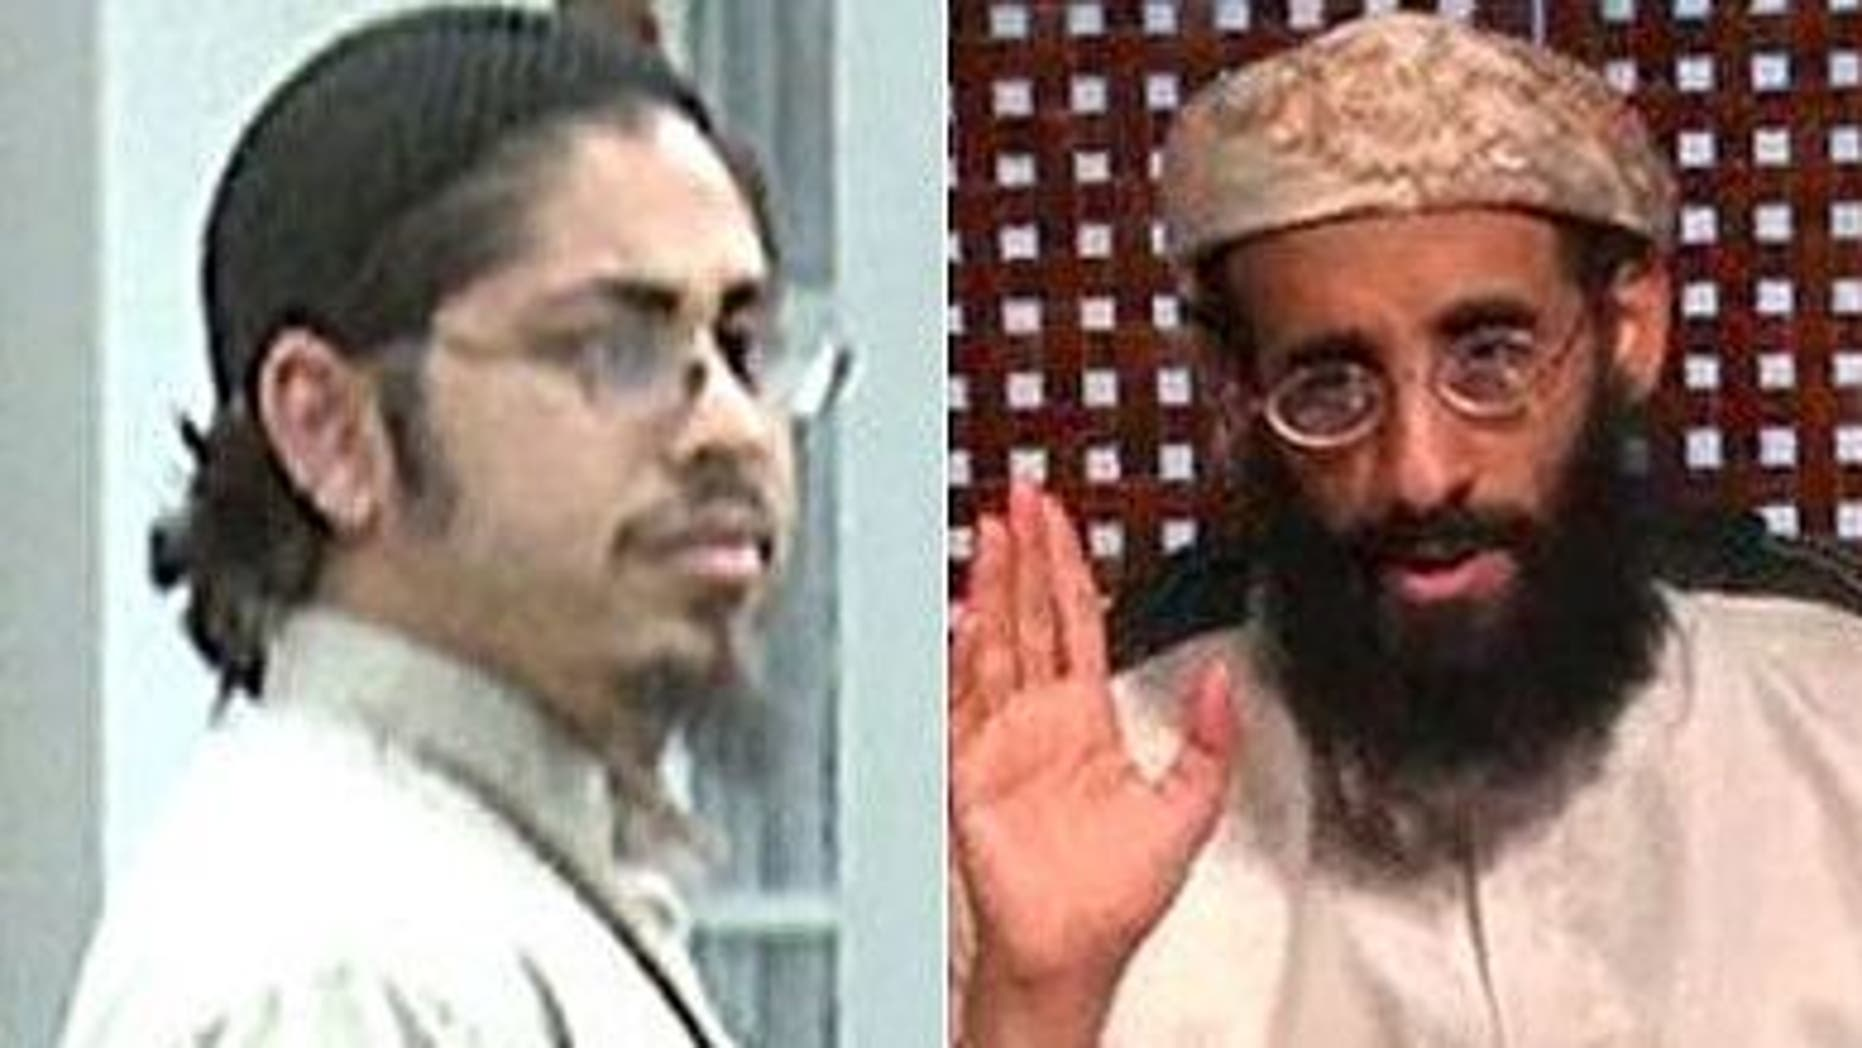 CIA-led drone attack kills terror leader Anwar al-Awlaki and Al Qaeda magazine editor Samir Khan in Yemen, in a strike that used two Predator drones and Hellfire missiles.